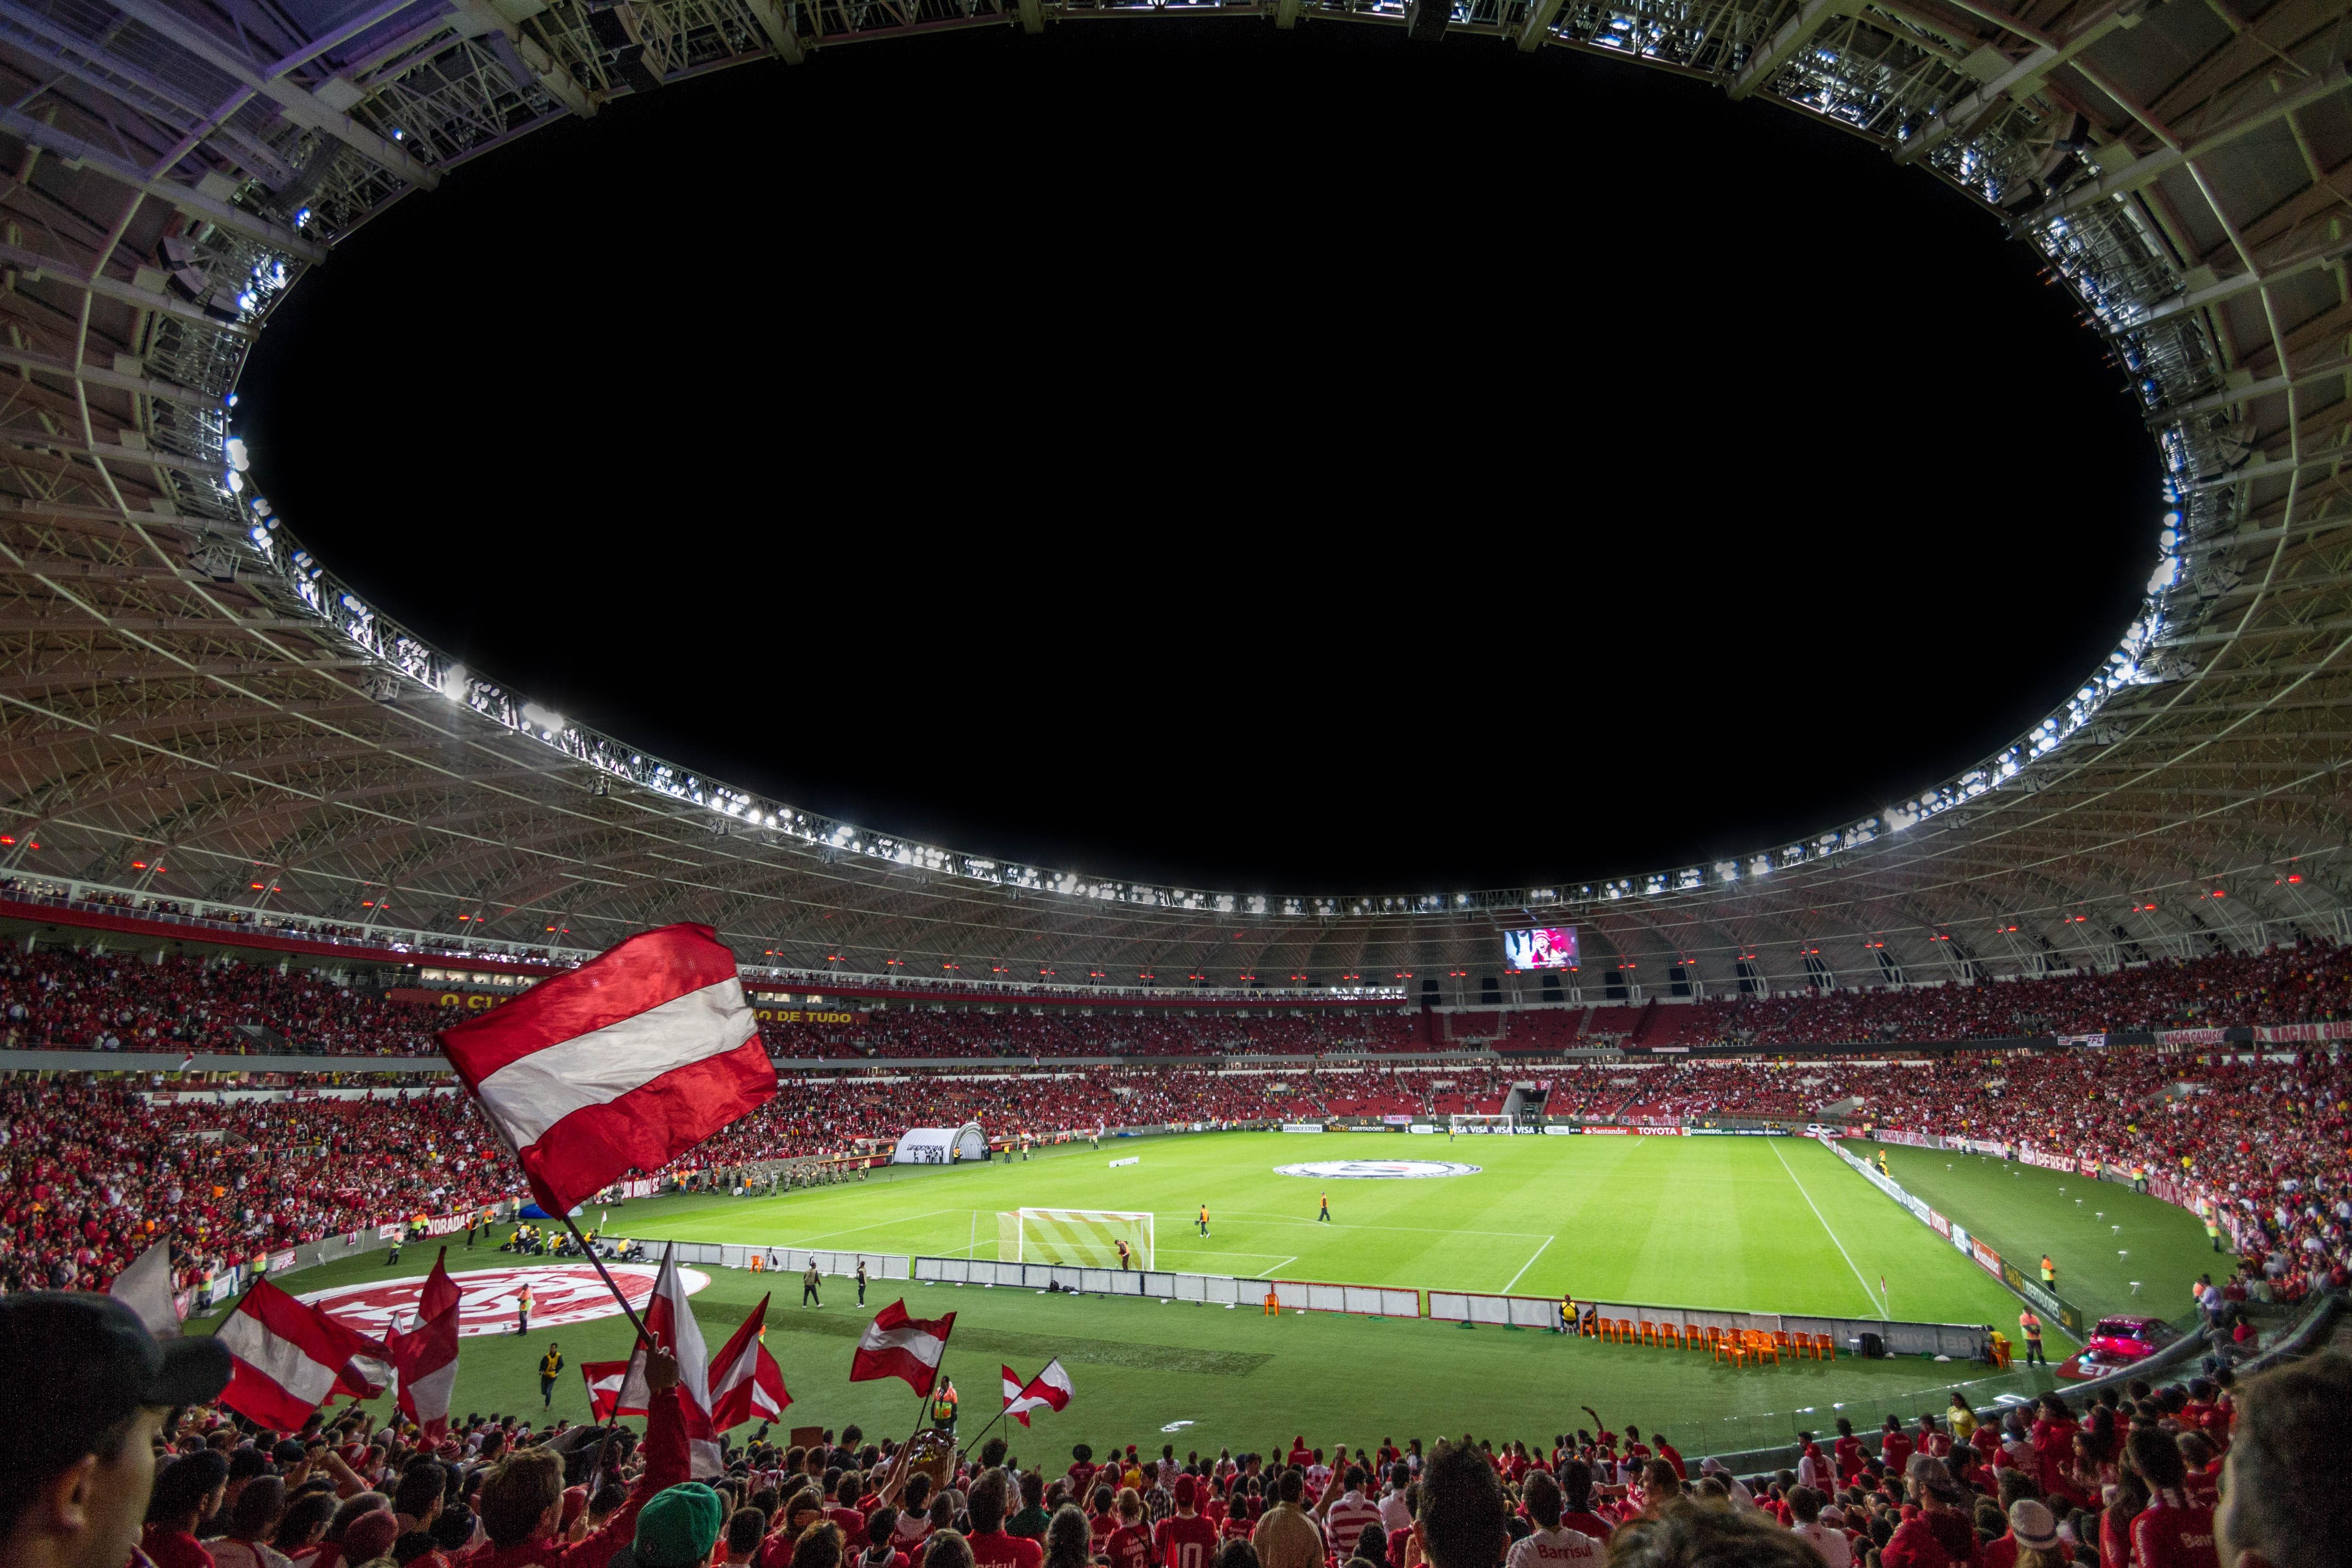 arena-brasil-championship-41257